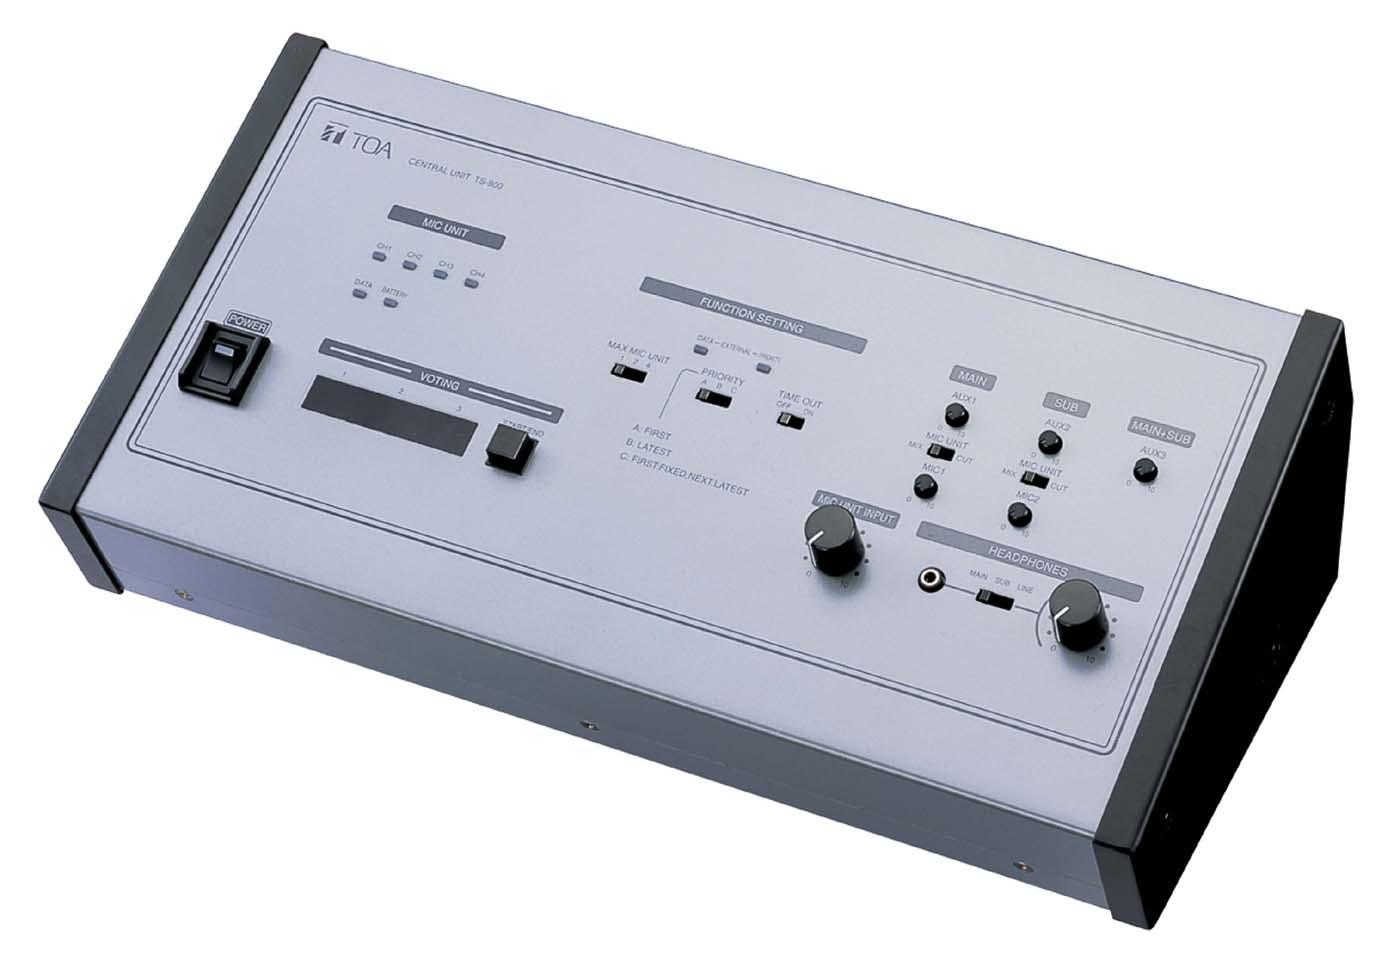 TOA MB-TS900 Rack-Mount Kit for TS-800 and TS-900 Series